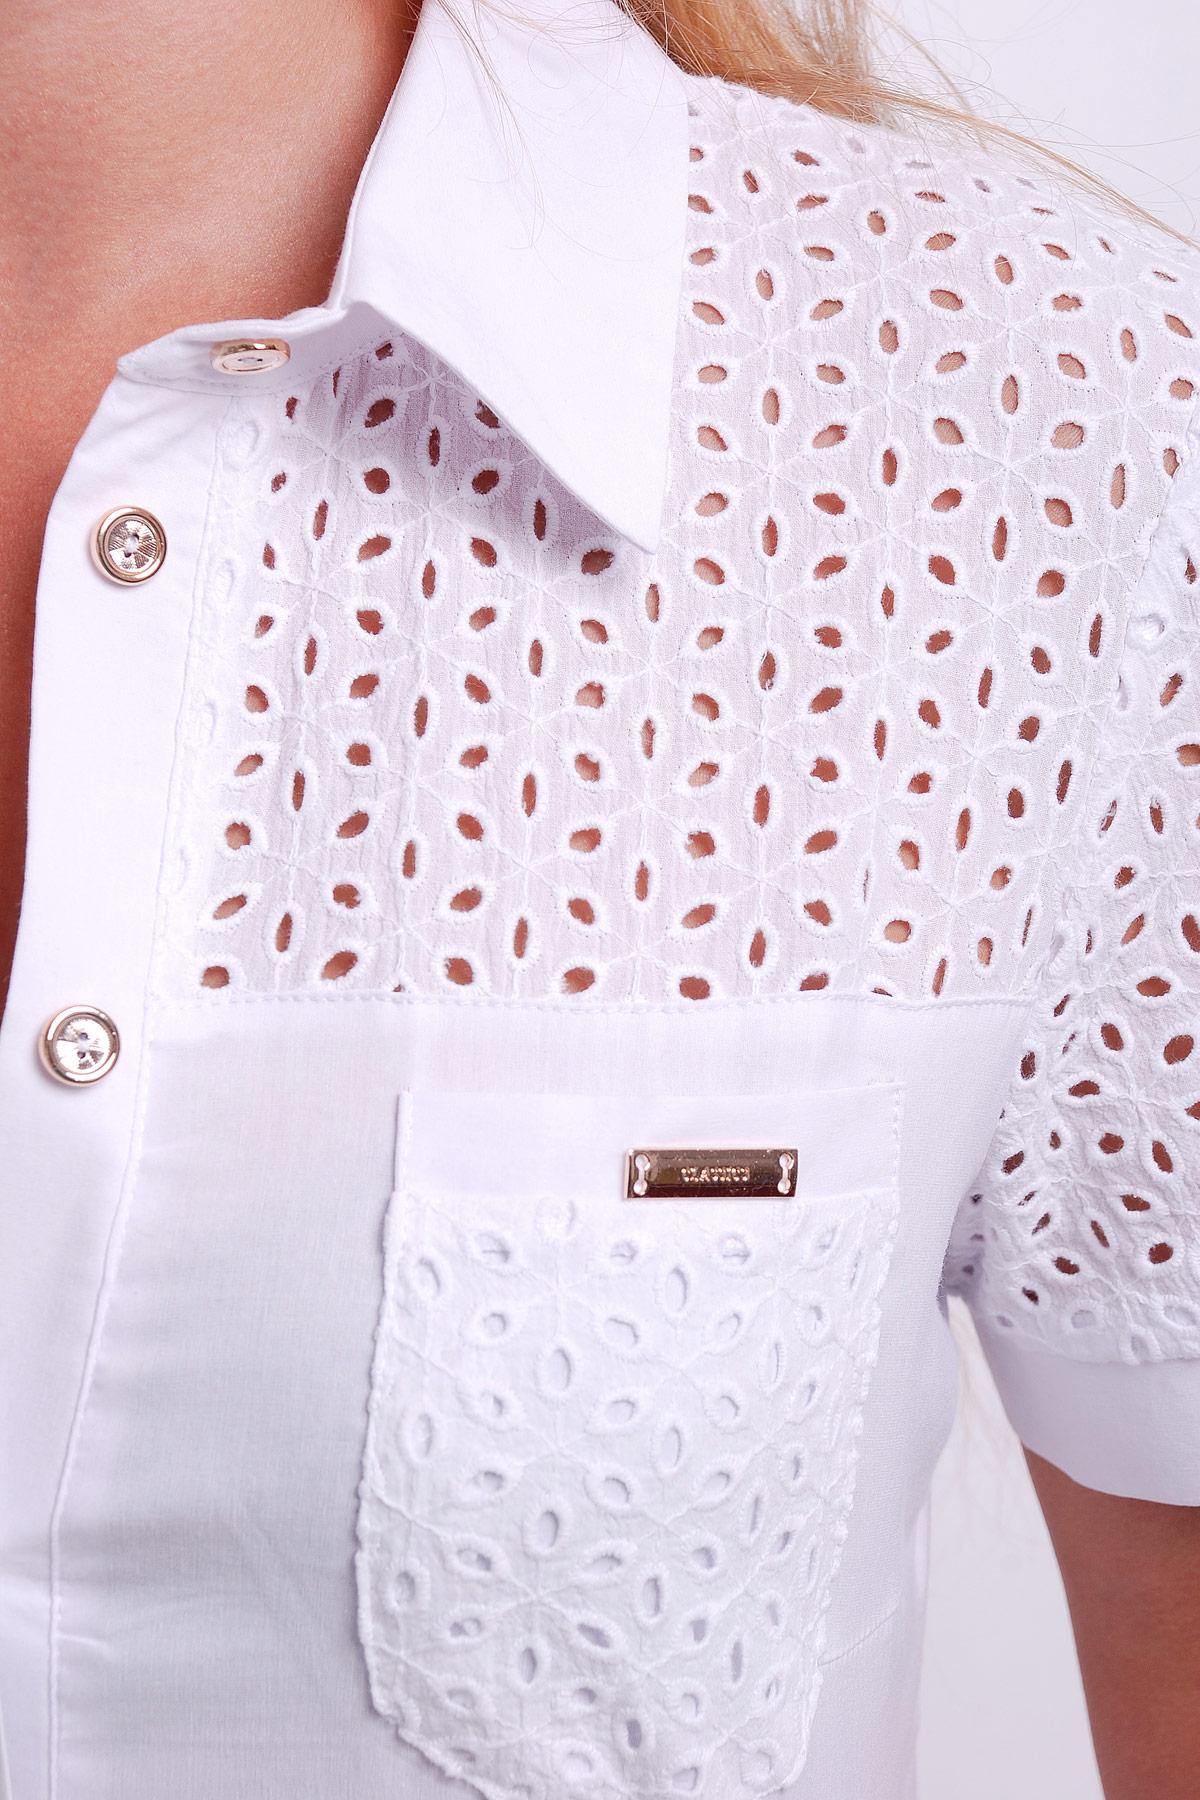 47a24e0153f Цвет  женская блузка белая большого размера. блуза Фауста-Б к р. Цвет